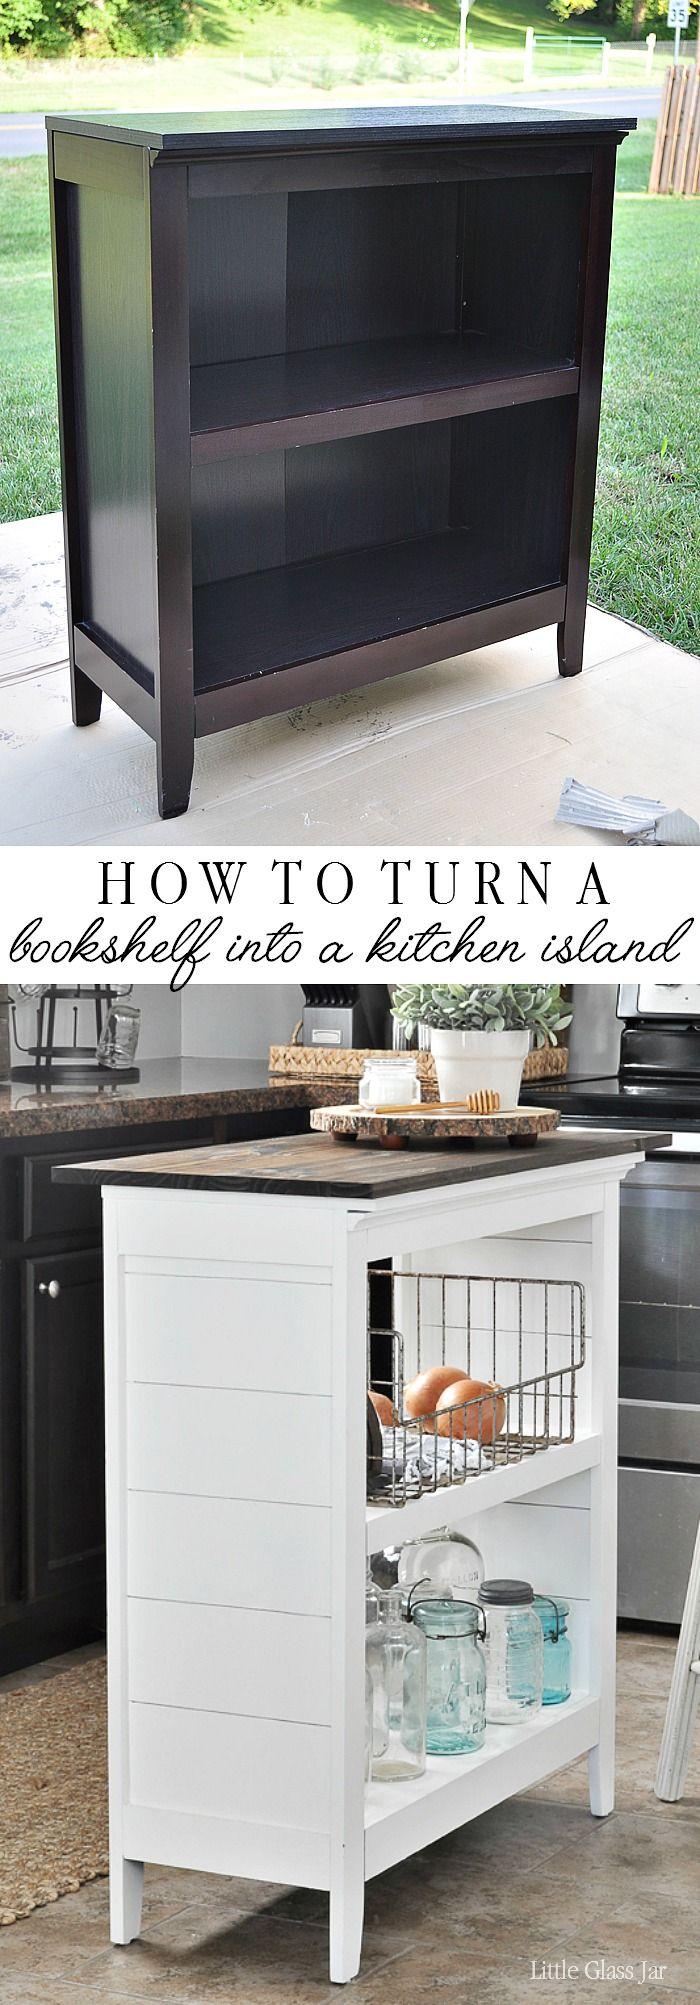 Bookshelf Kitchen Island | Clever, Tutorials and Kitchens